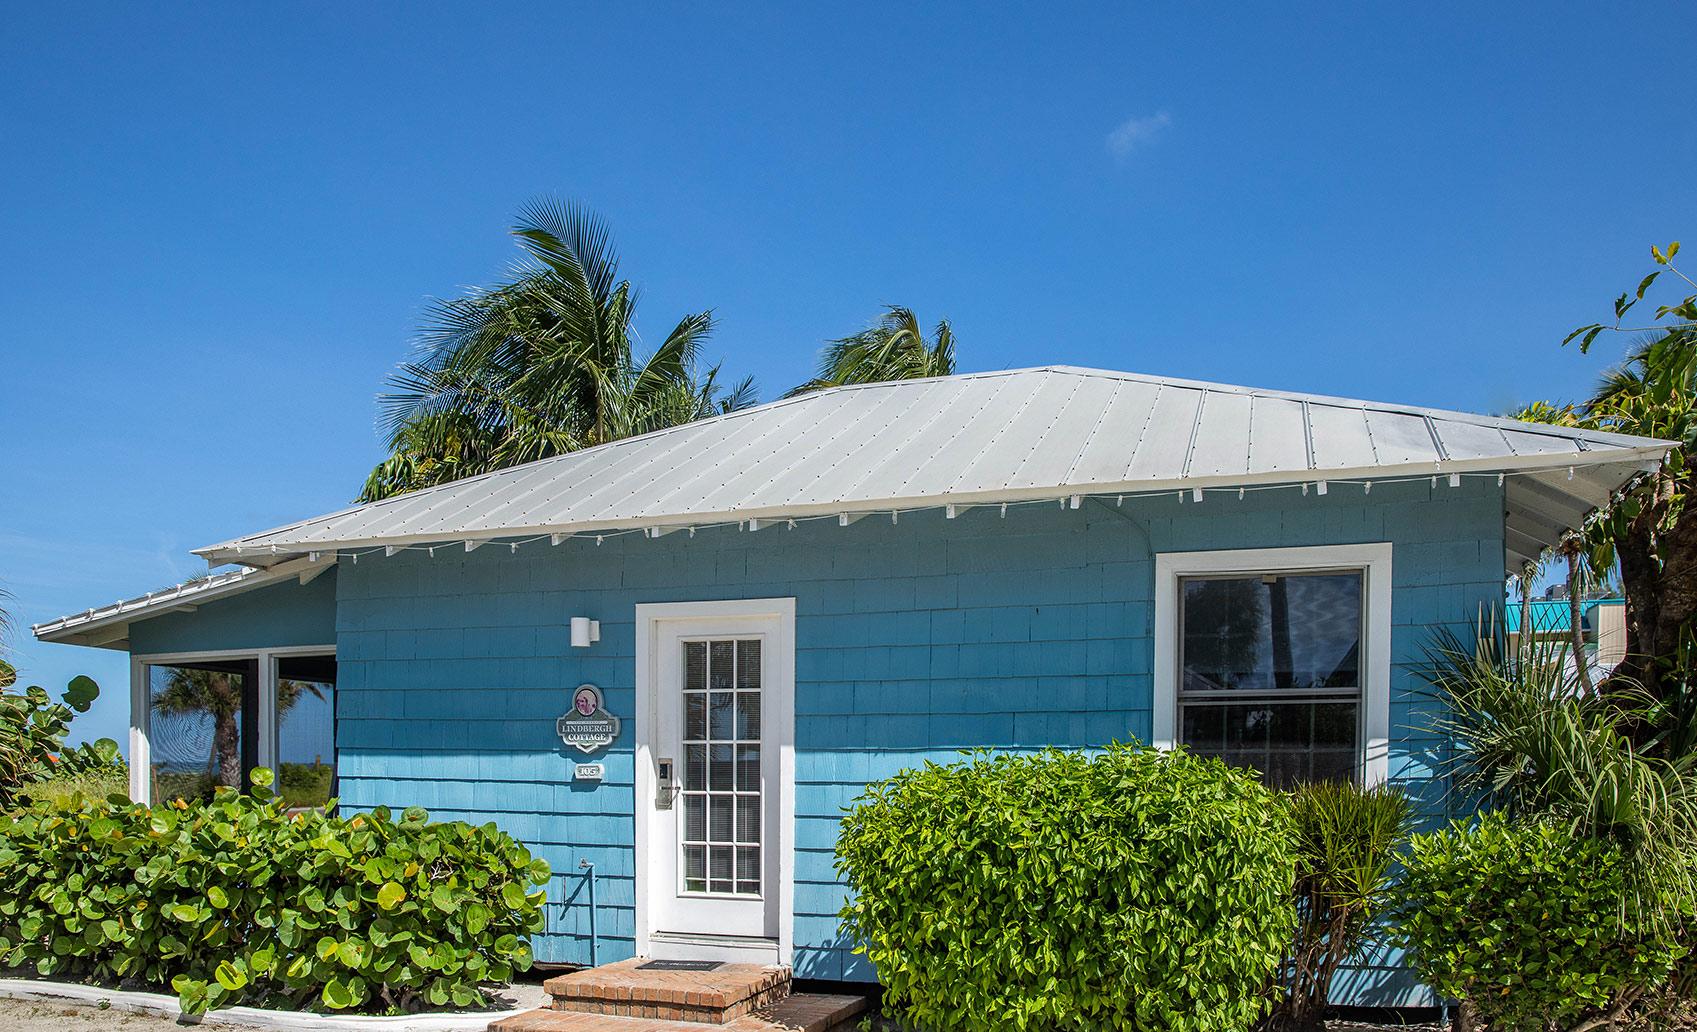 Historial Cottages in Florida, Captiva Island